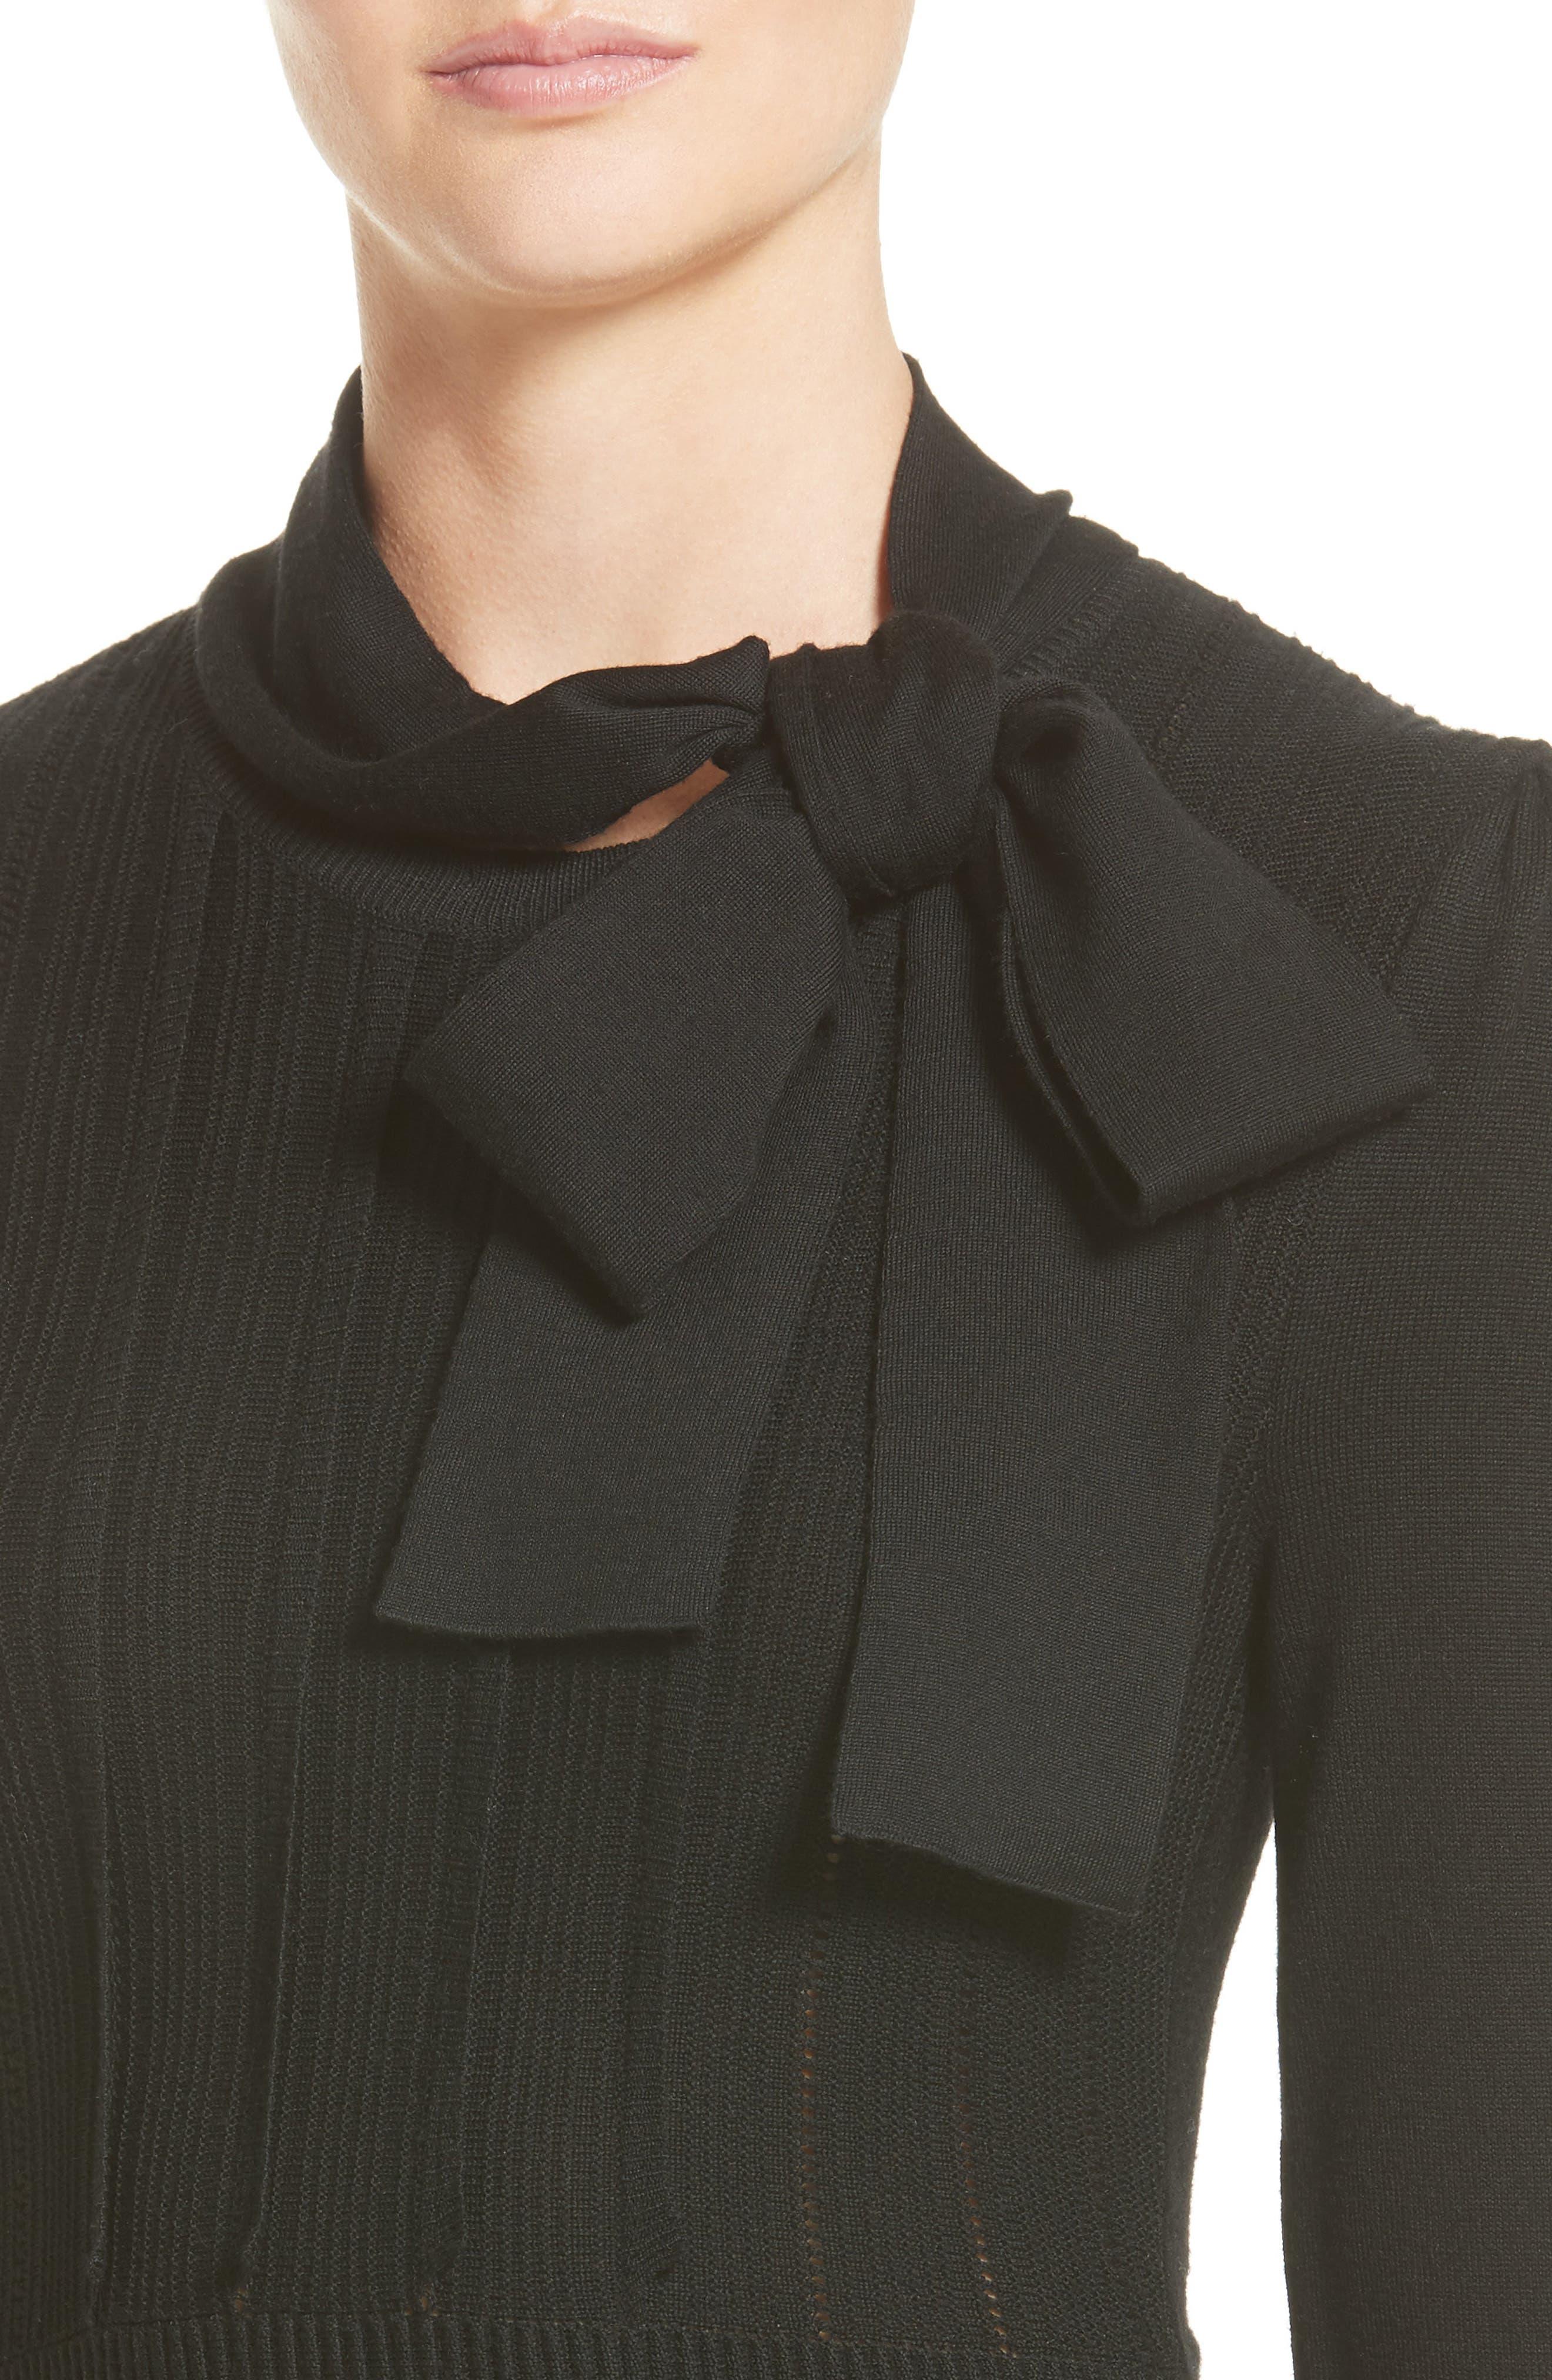 Ruffle Skirt Wool Knit Dress,                             Alternate thumbnail 7, color,                             Black